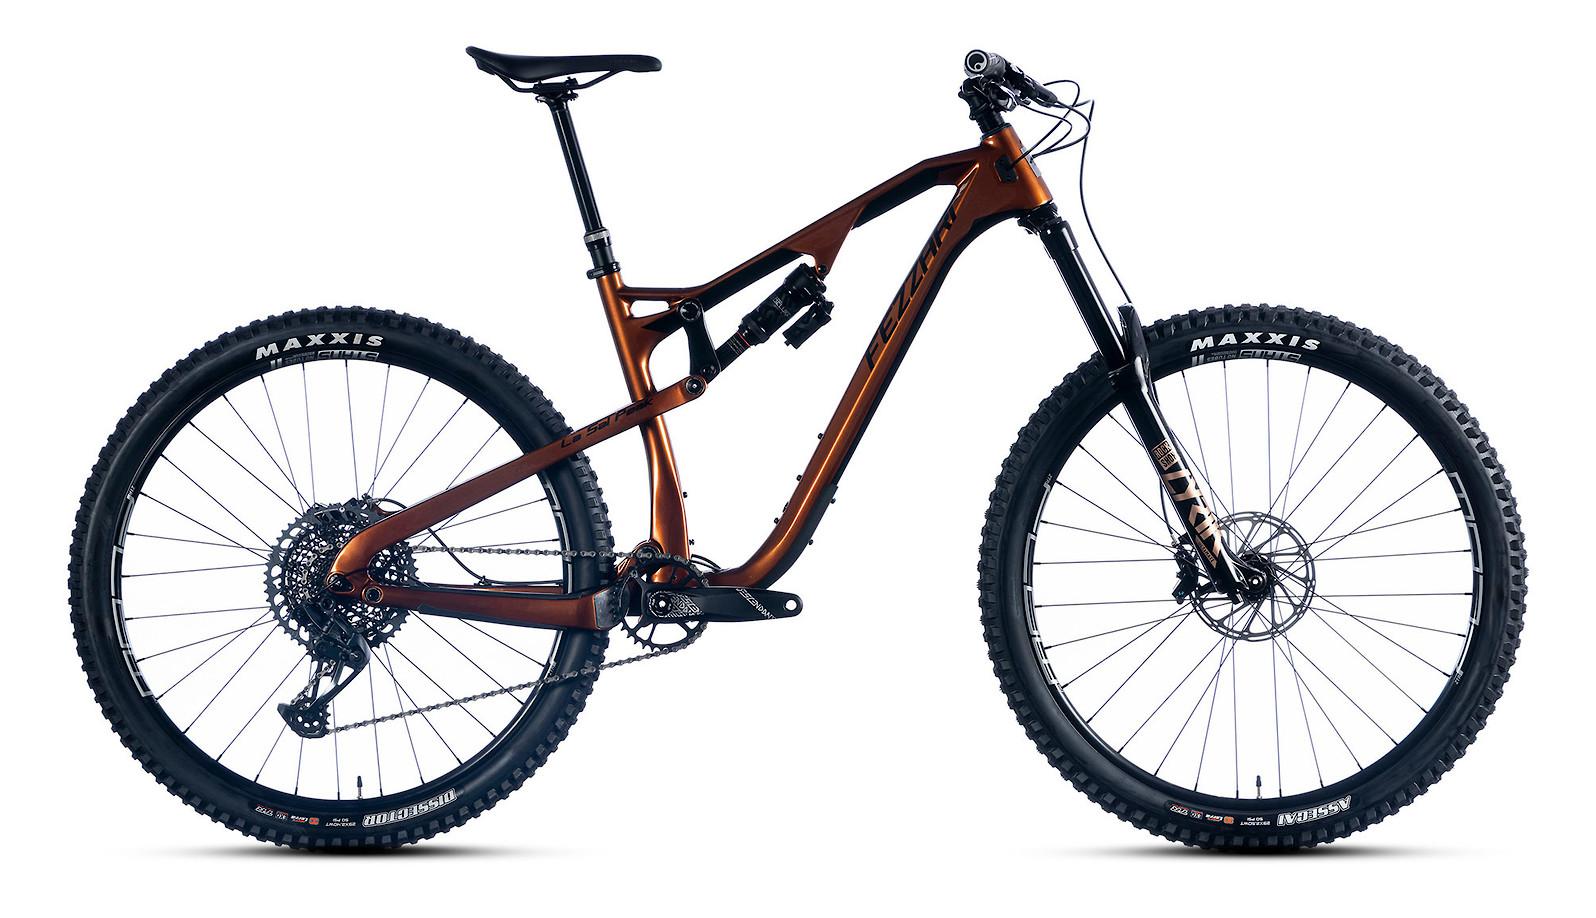 2021 Fezzari La Sal Peak Elite (Burnt Orange)